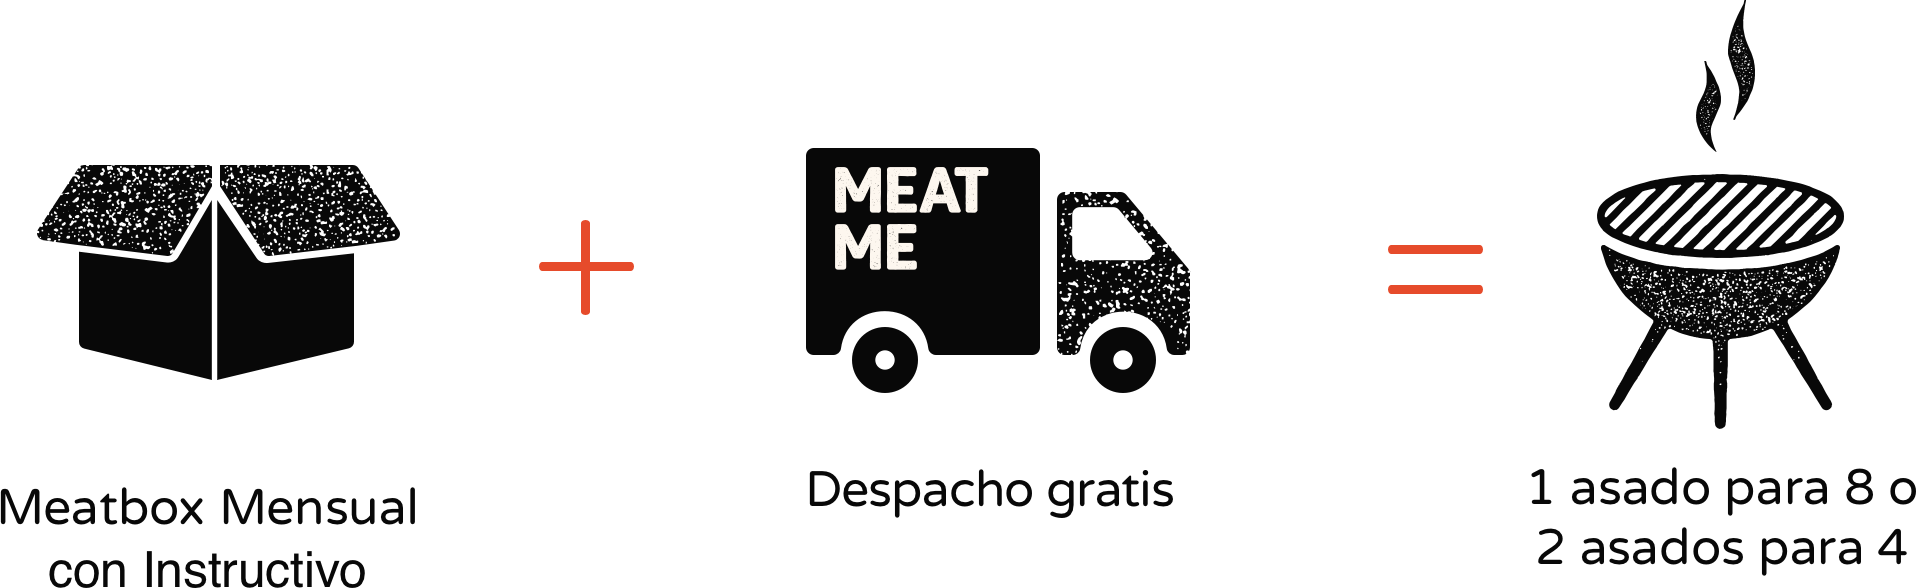 Meatbox mensual con instructivo. Despacho gratis. 1 asado para 8 o 2 para 4.